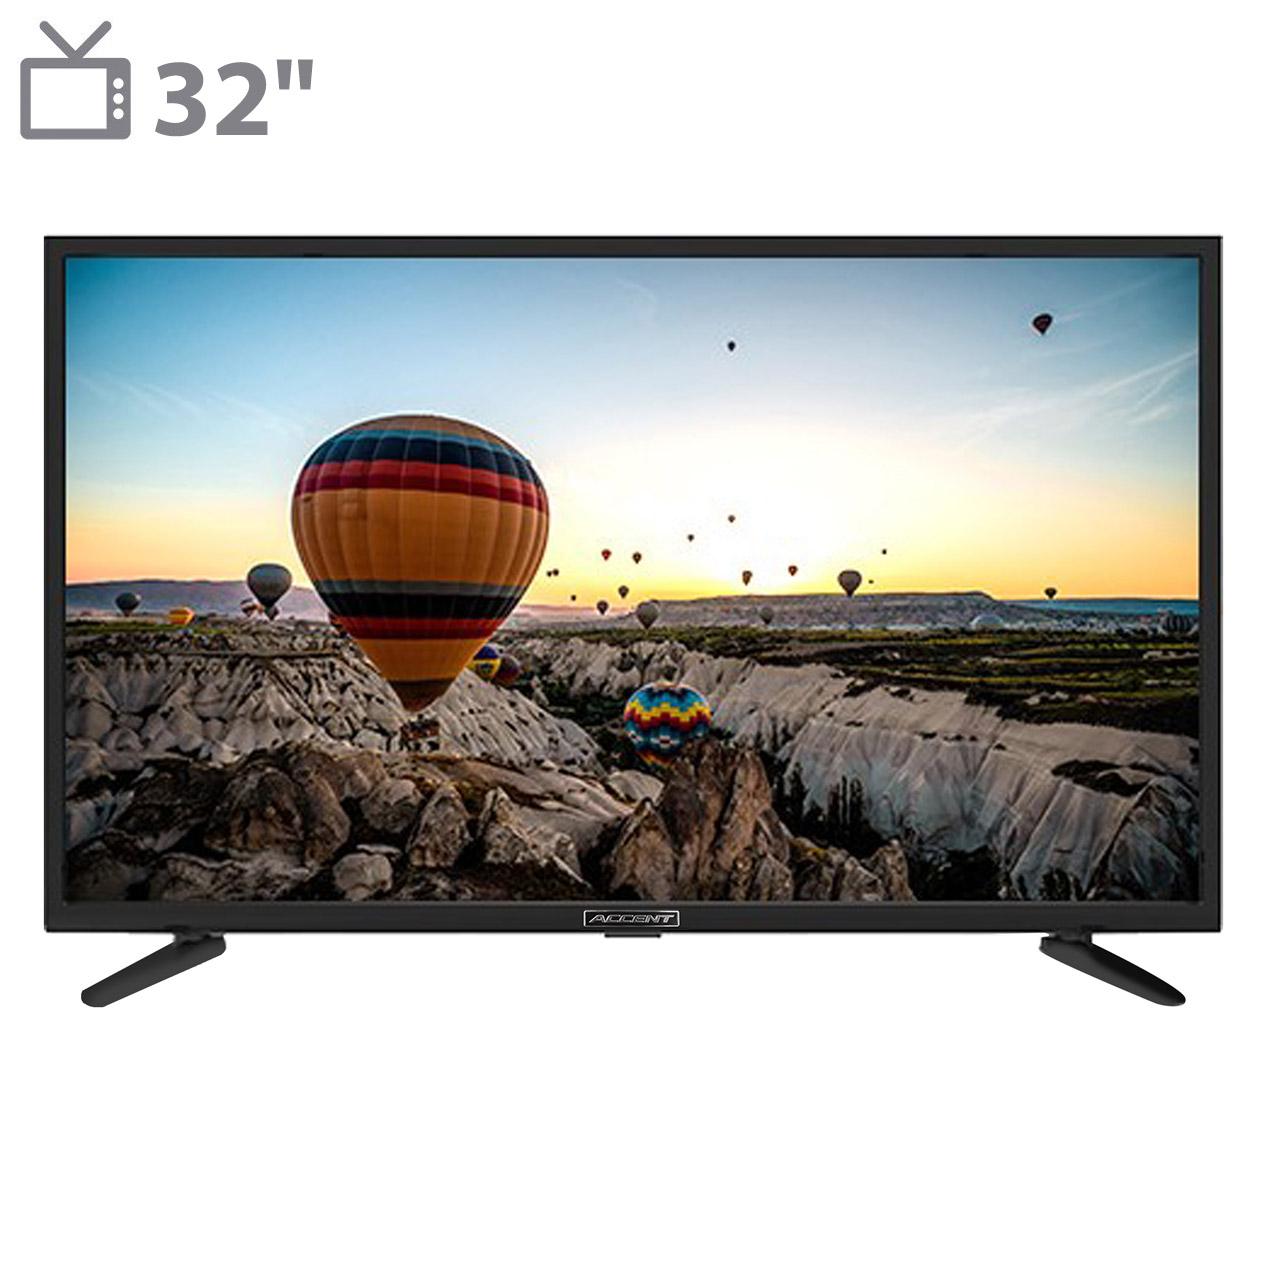 تلویزیون ال ای دی اکسنت مدل ACT3219 سایز 32 اینچ